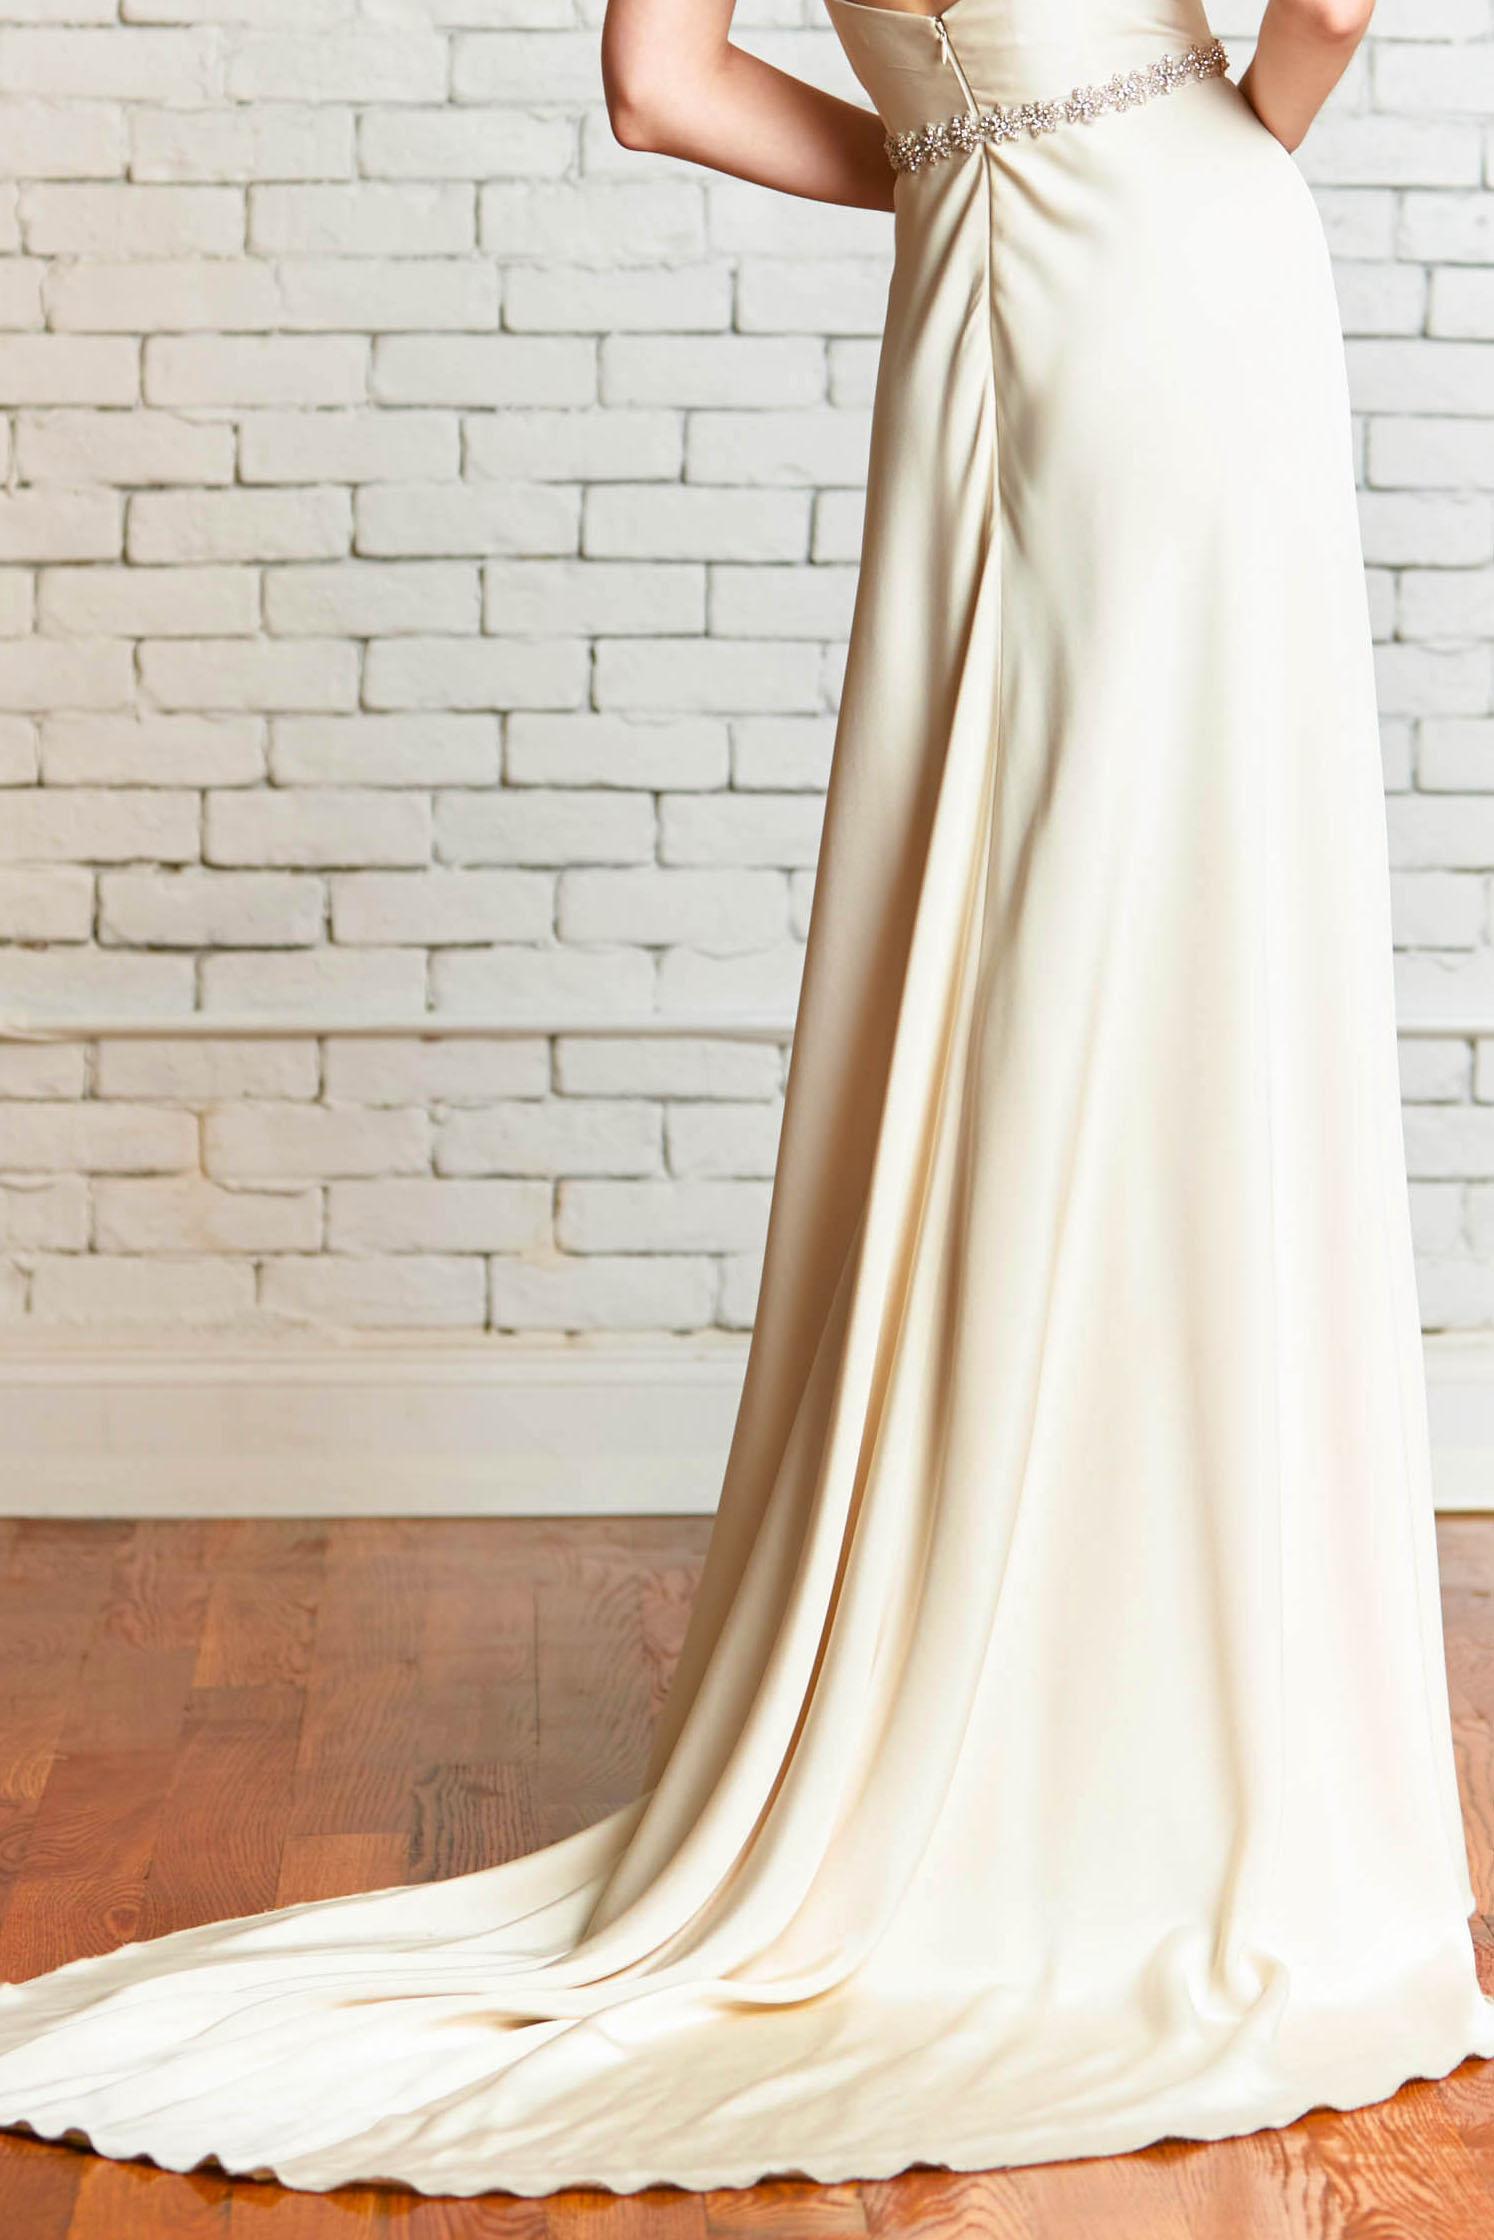 Grace_skirt-back_Modern_Bride_Clean_Silhouette_Train.jpg